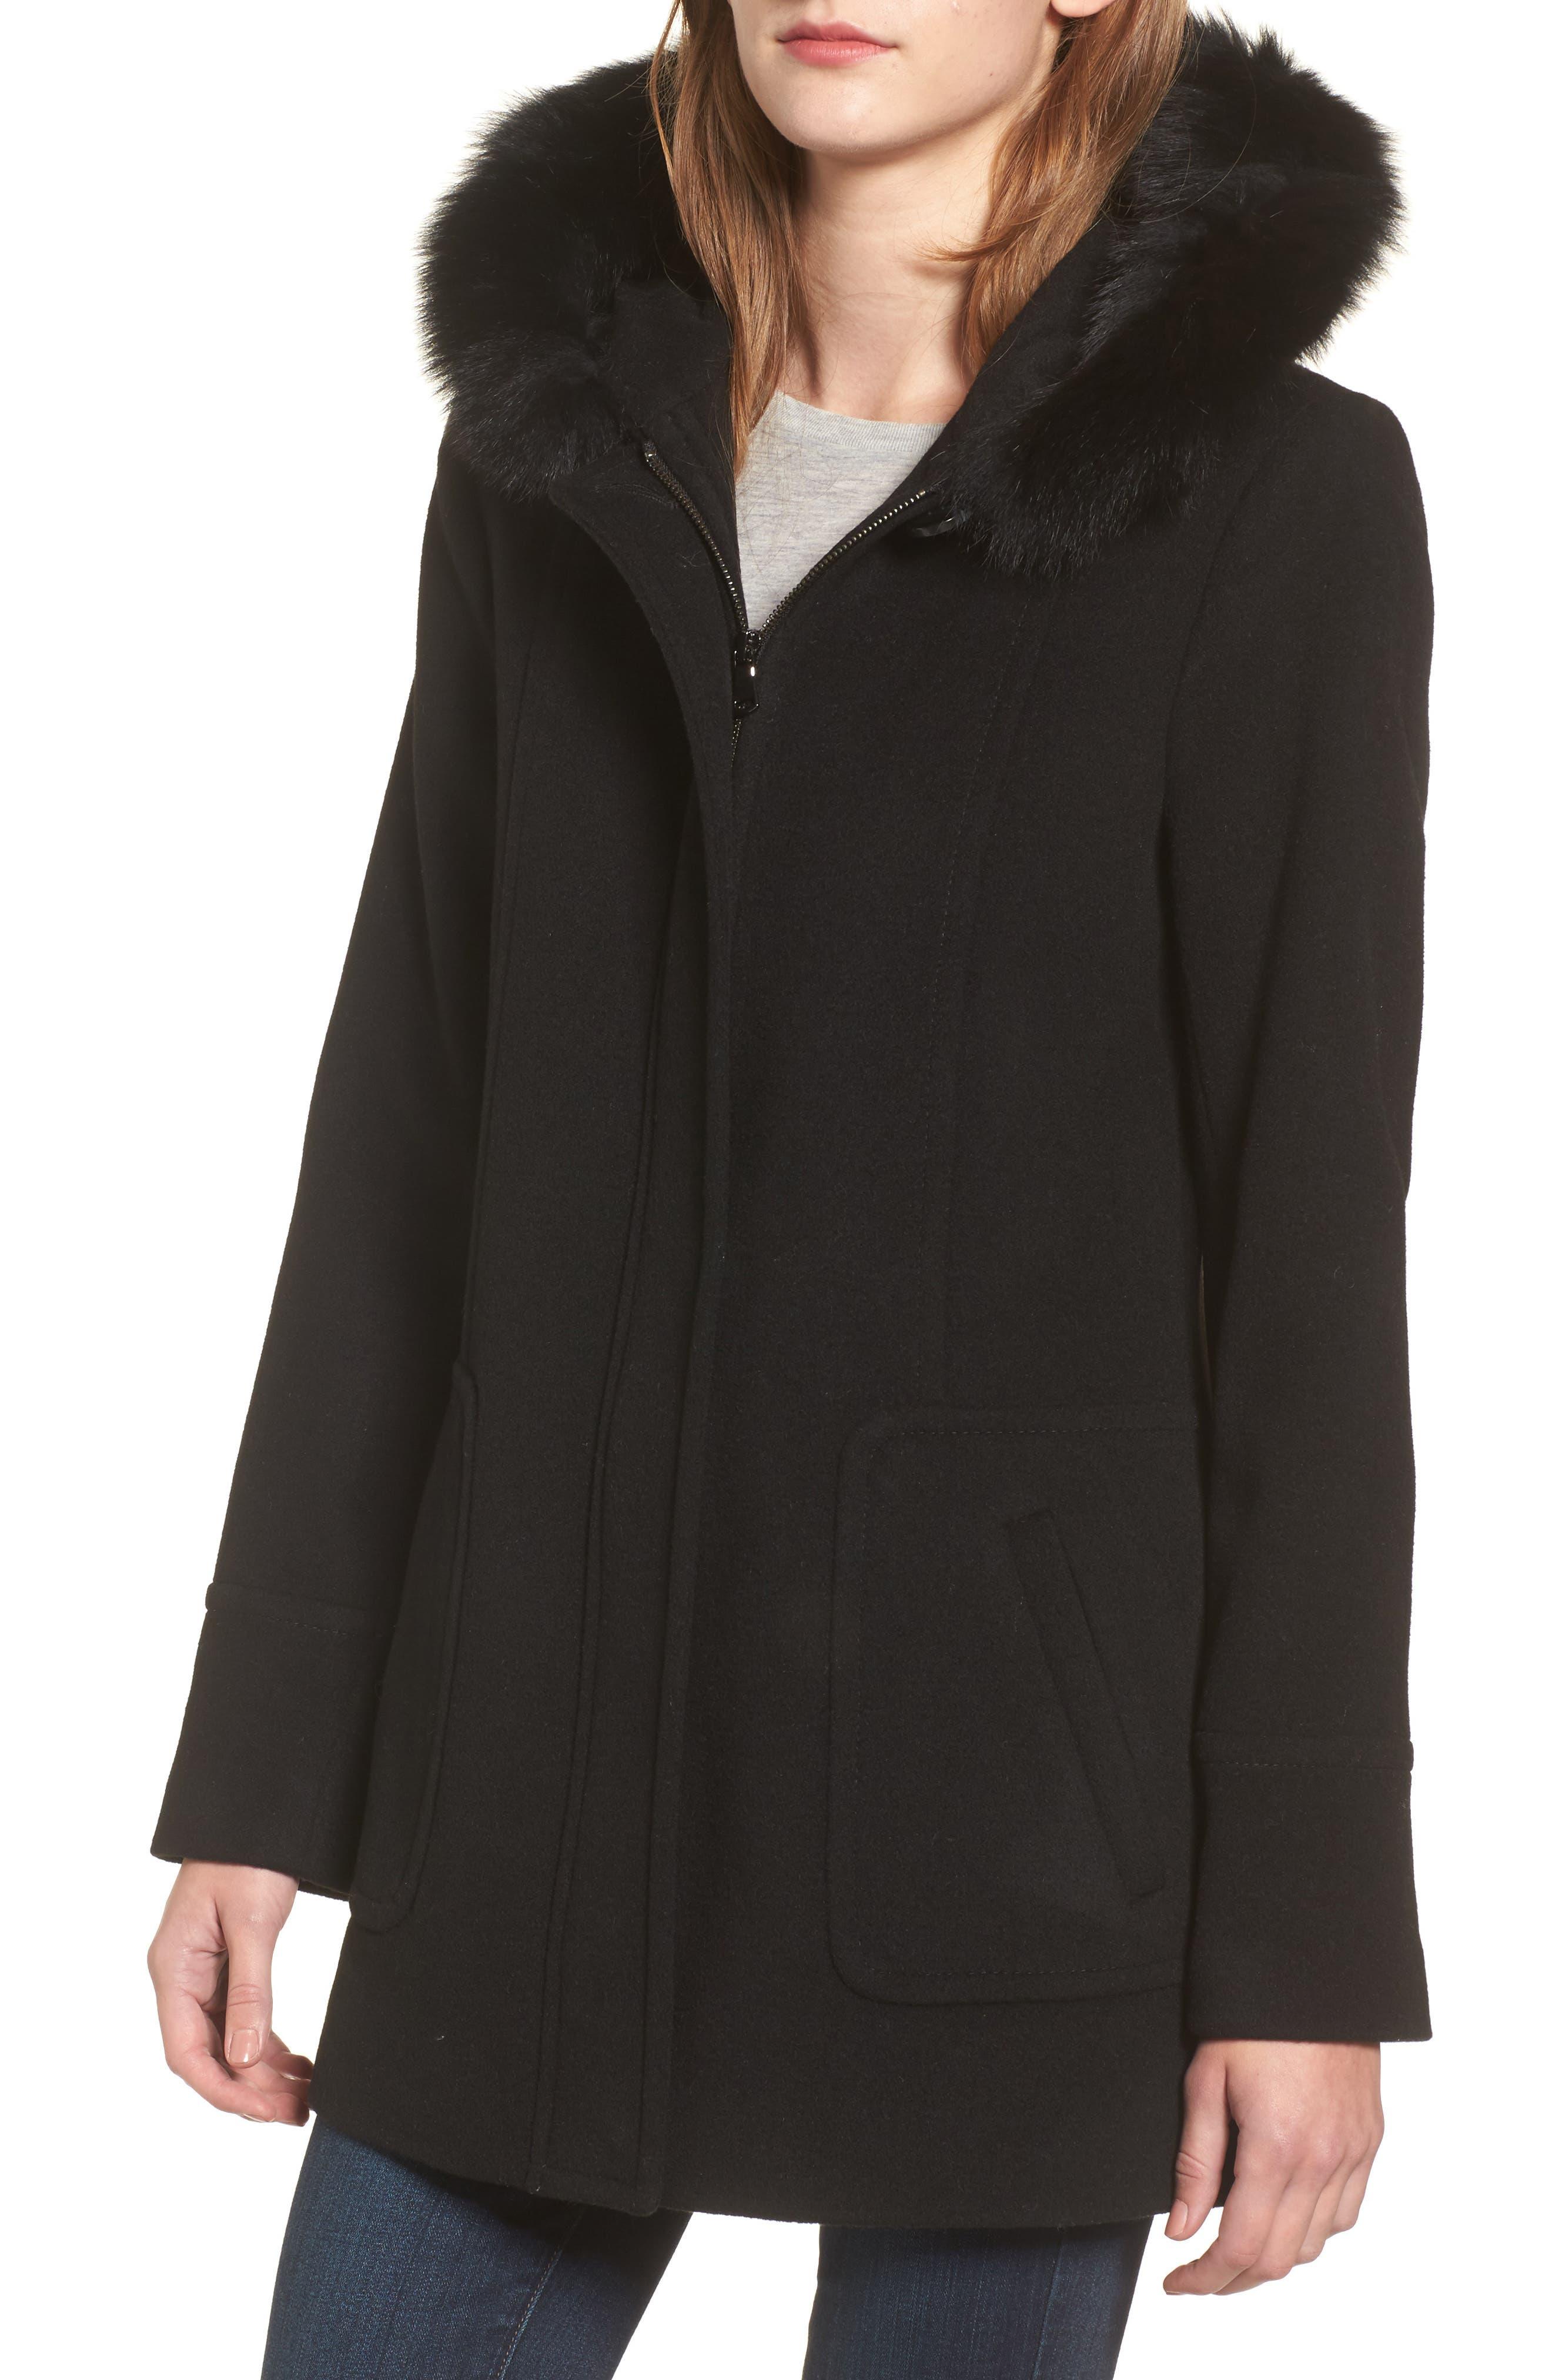 Hooded Wool Blend Coat with Genuine Fox Fur Trim,                             Alternate thumbnail 4, color,                             Black